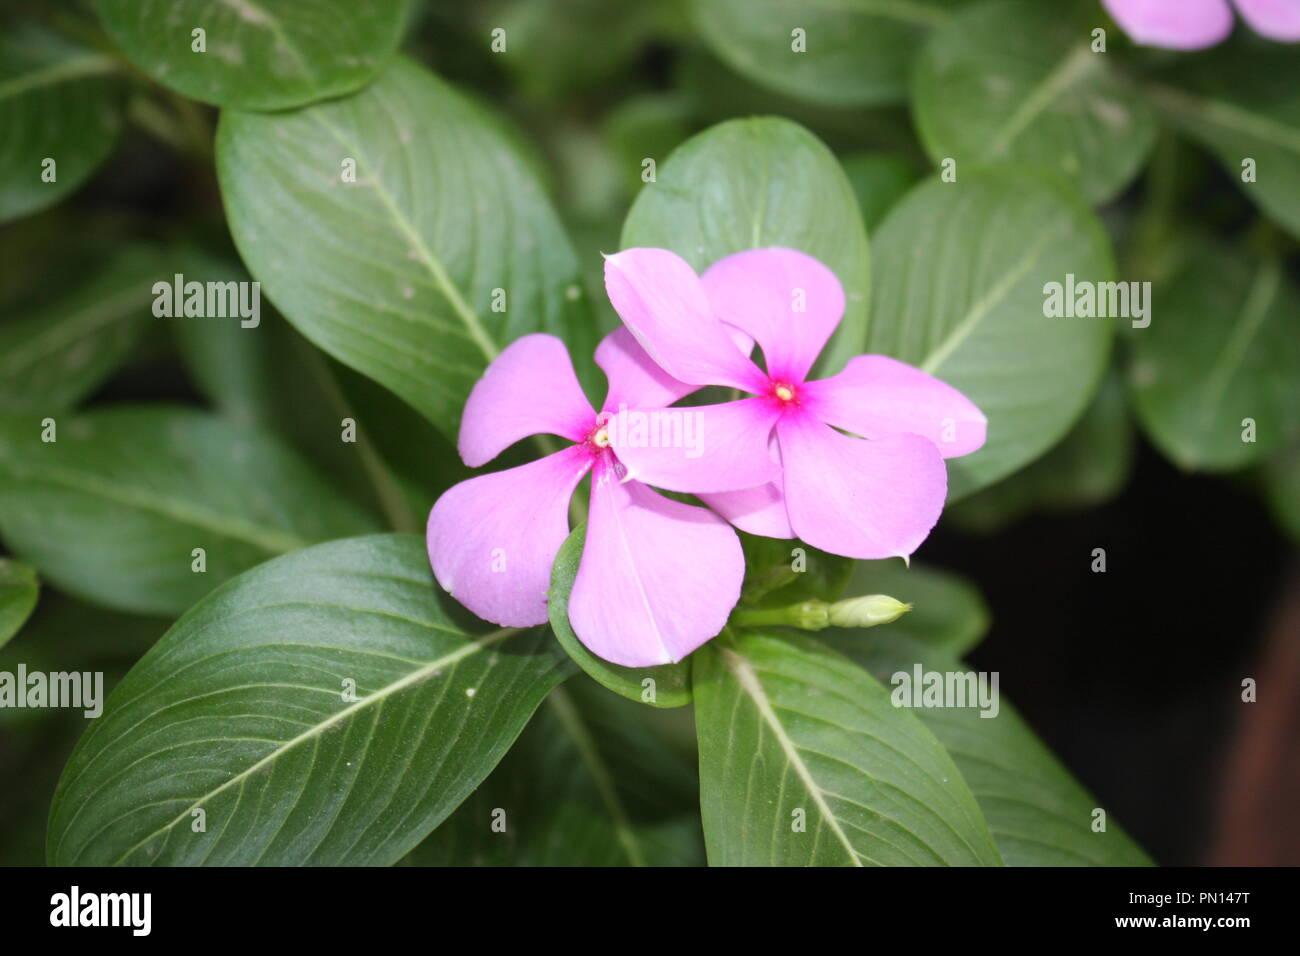 Pink periwinkle flower stock photos pink periwinkle flower stock pink periwinkle flower stock image mightylinksfo